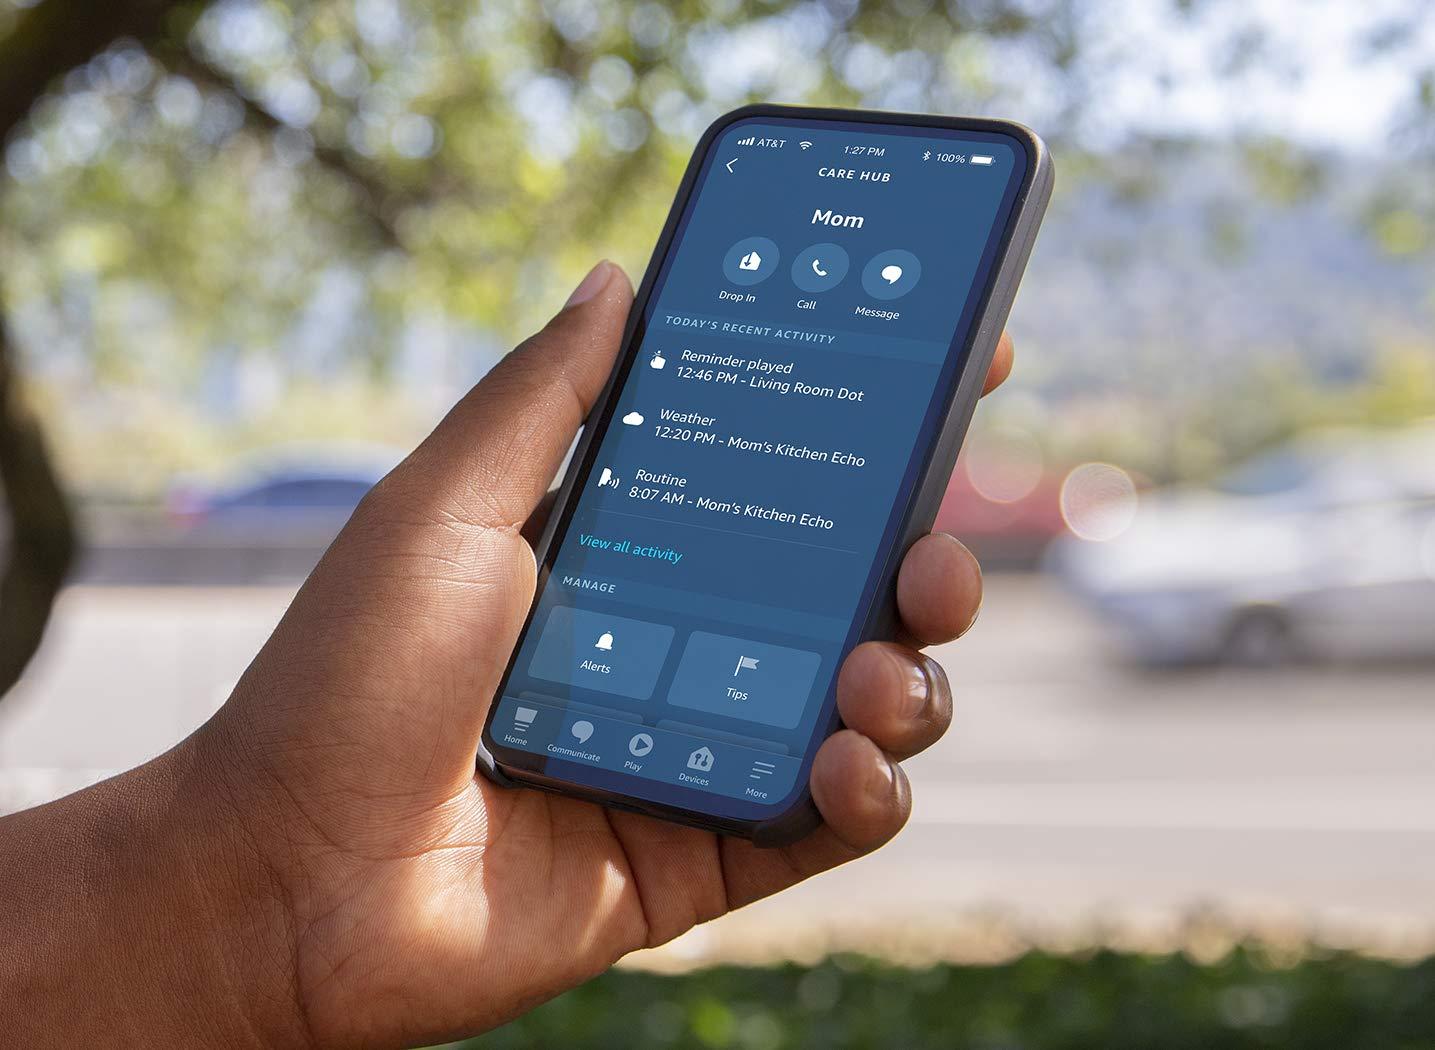 Alexa Care Hub App